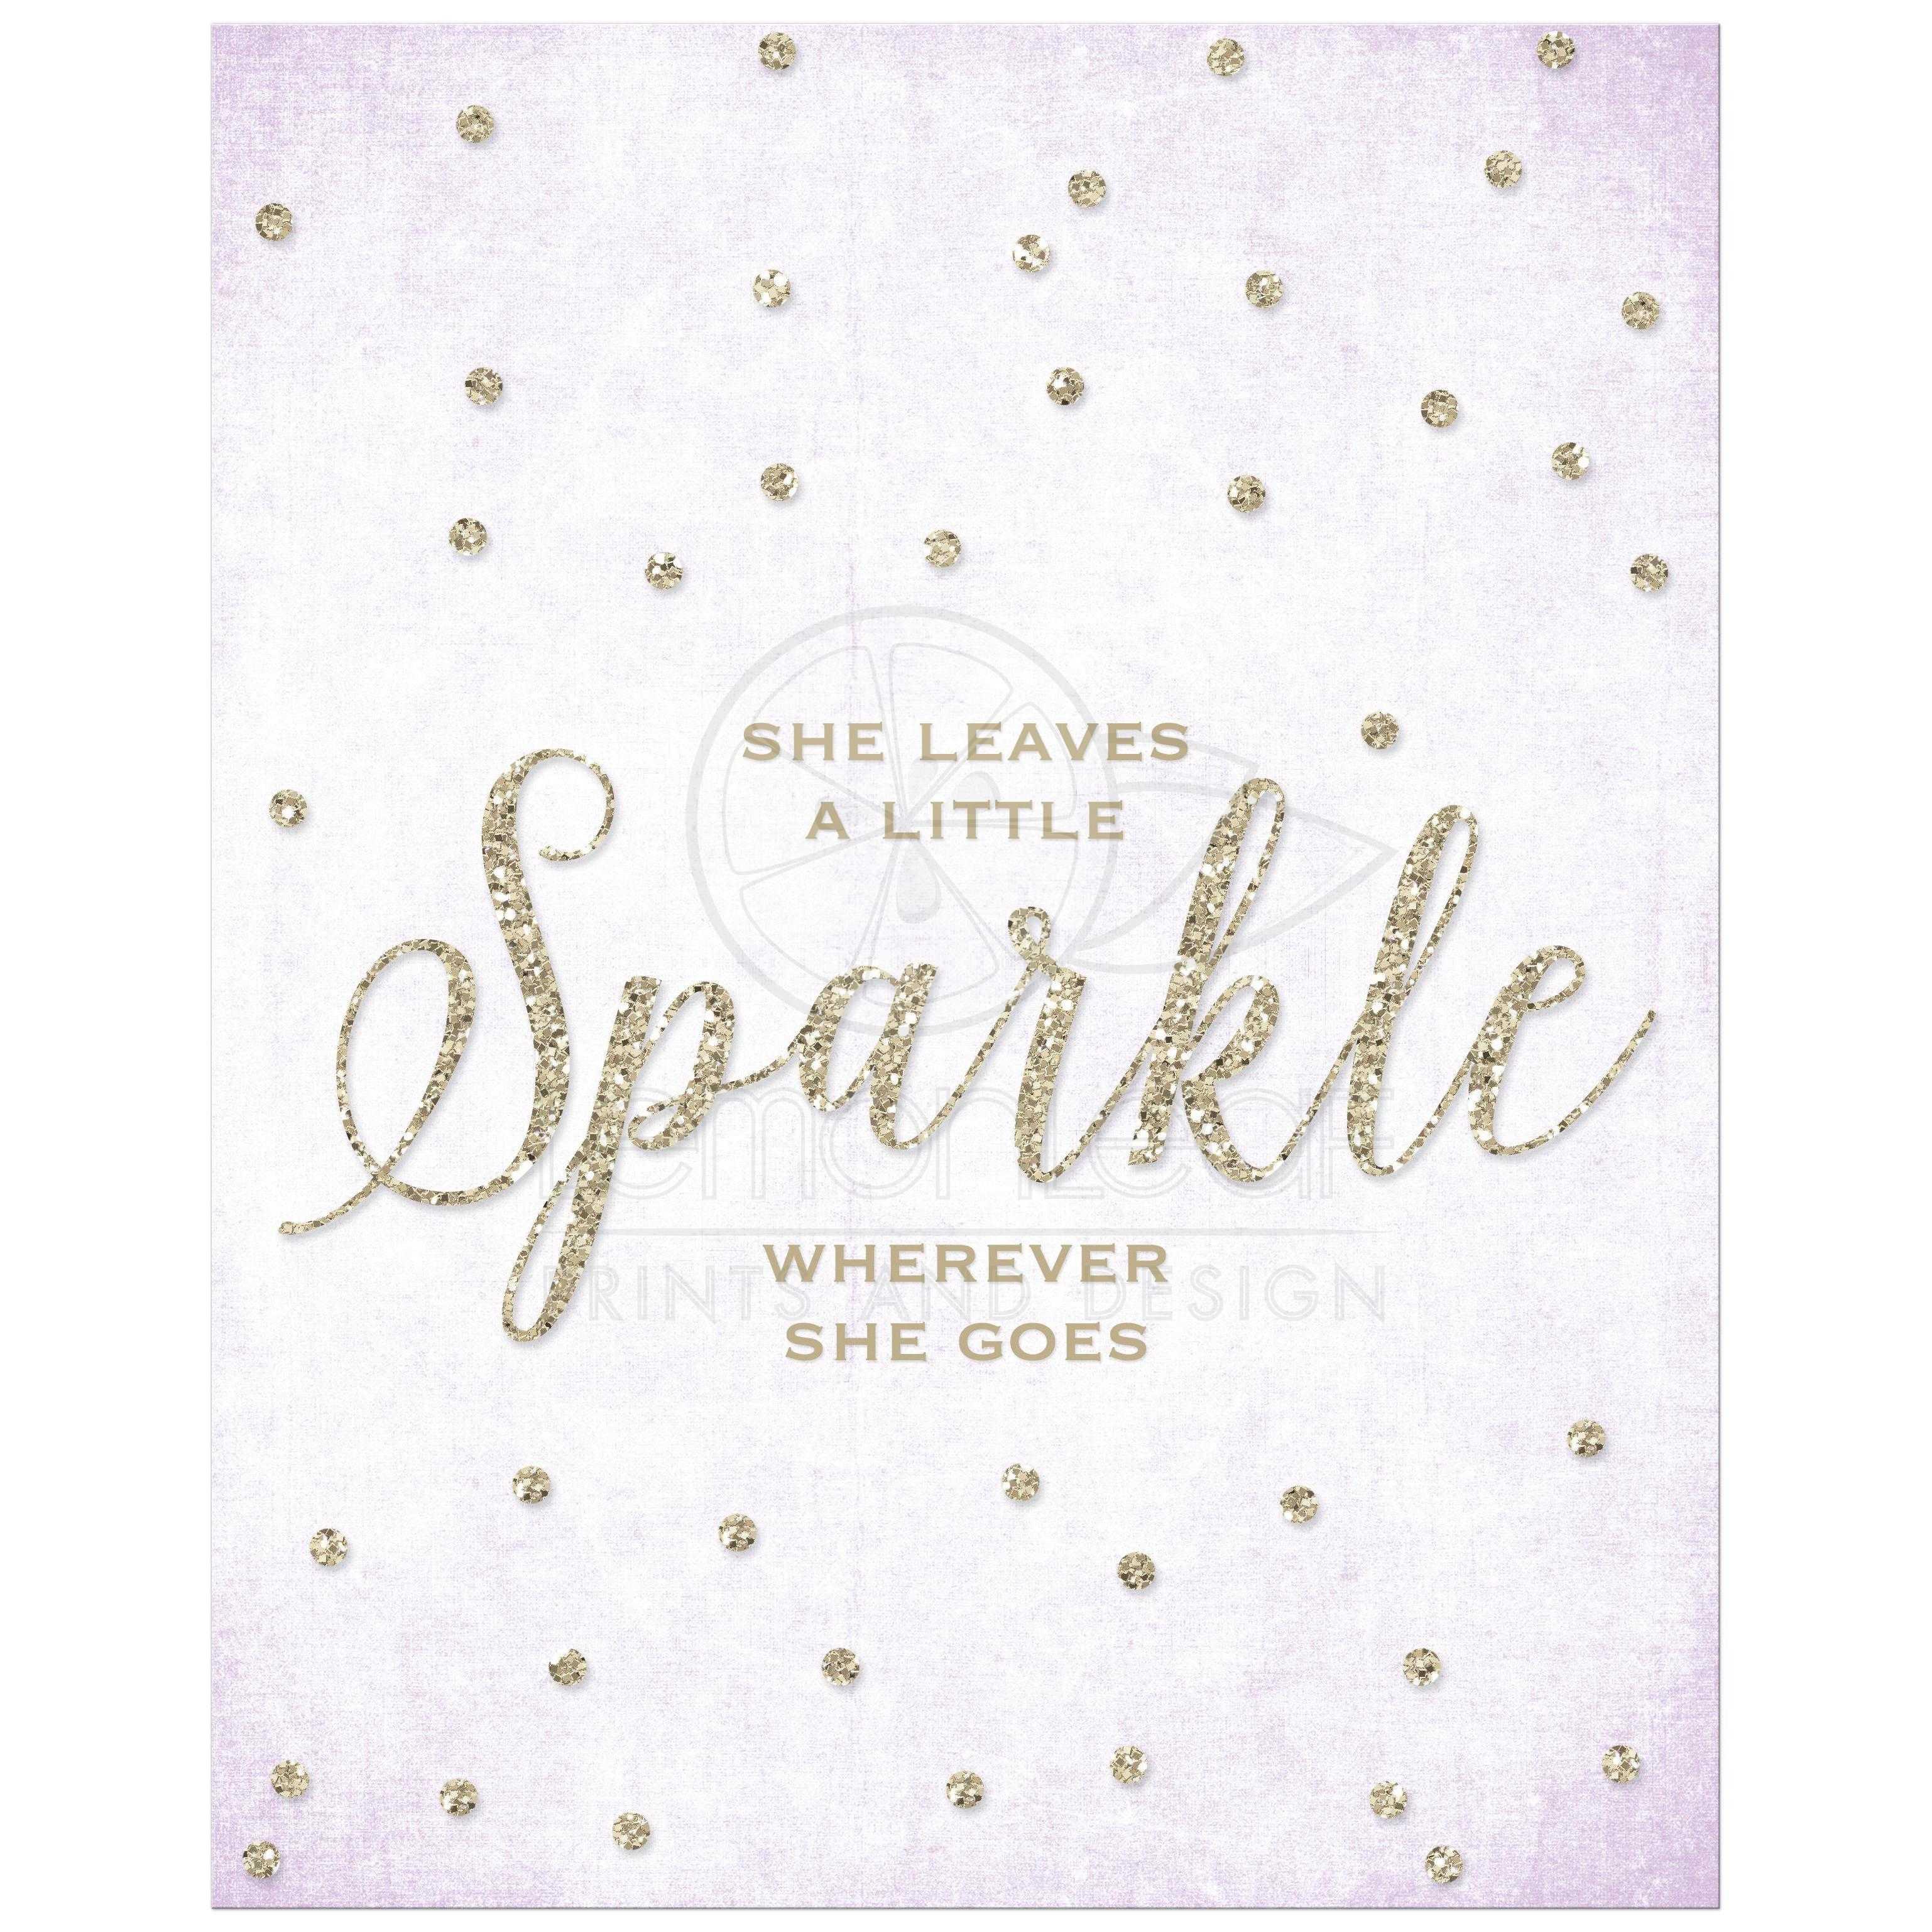 She Leaves A Little Sparkle Wherever She Goes Invitations